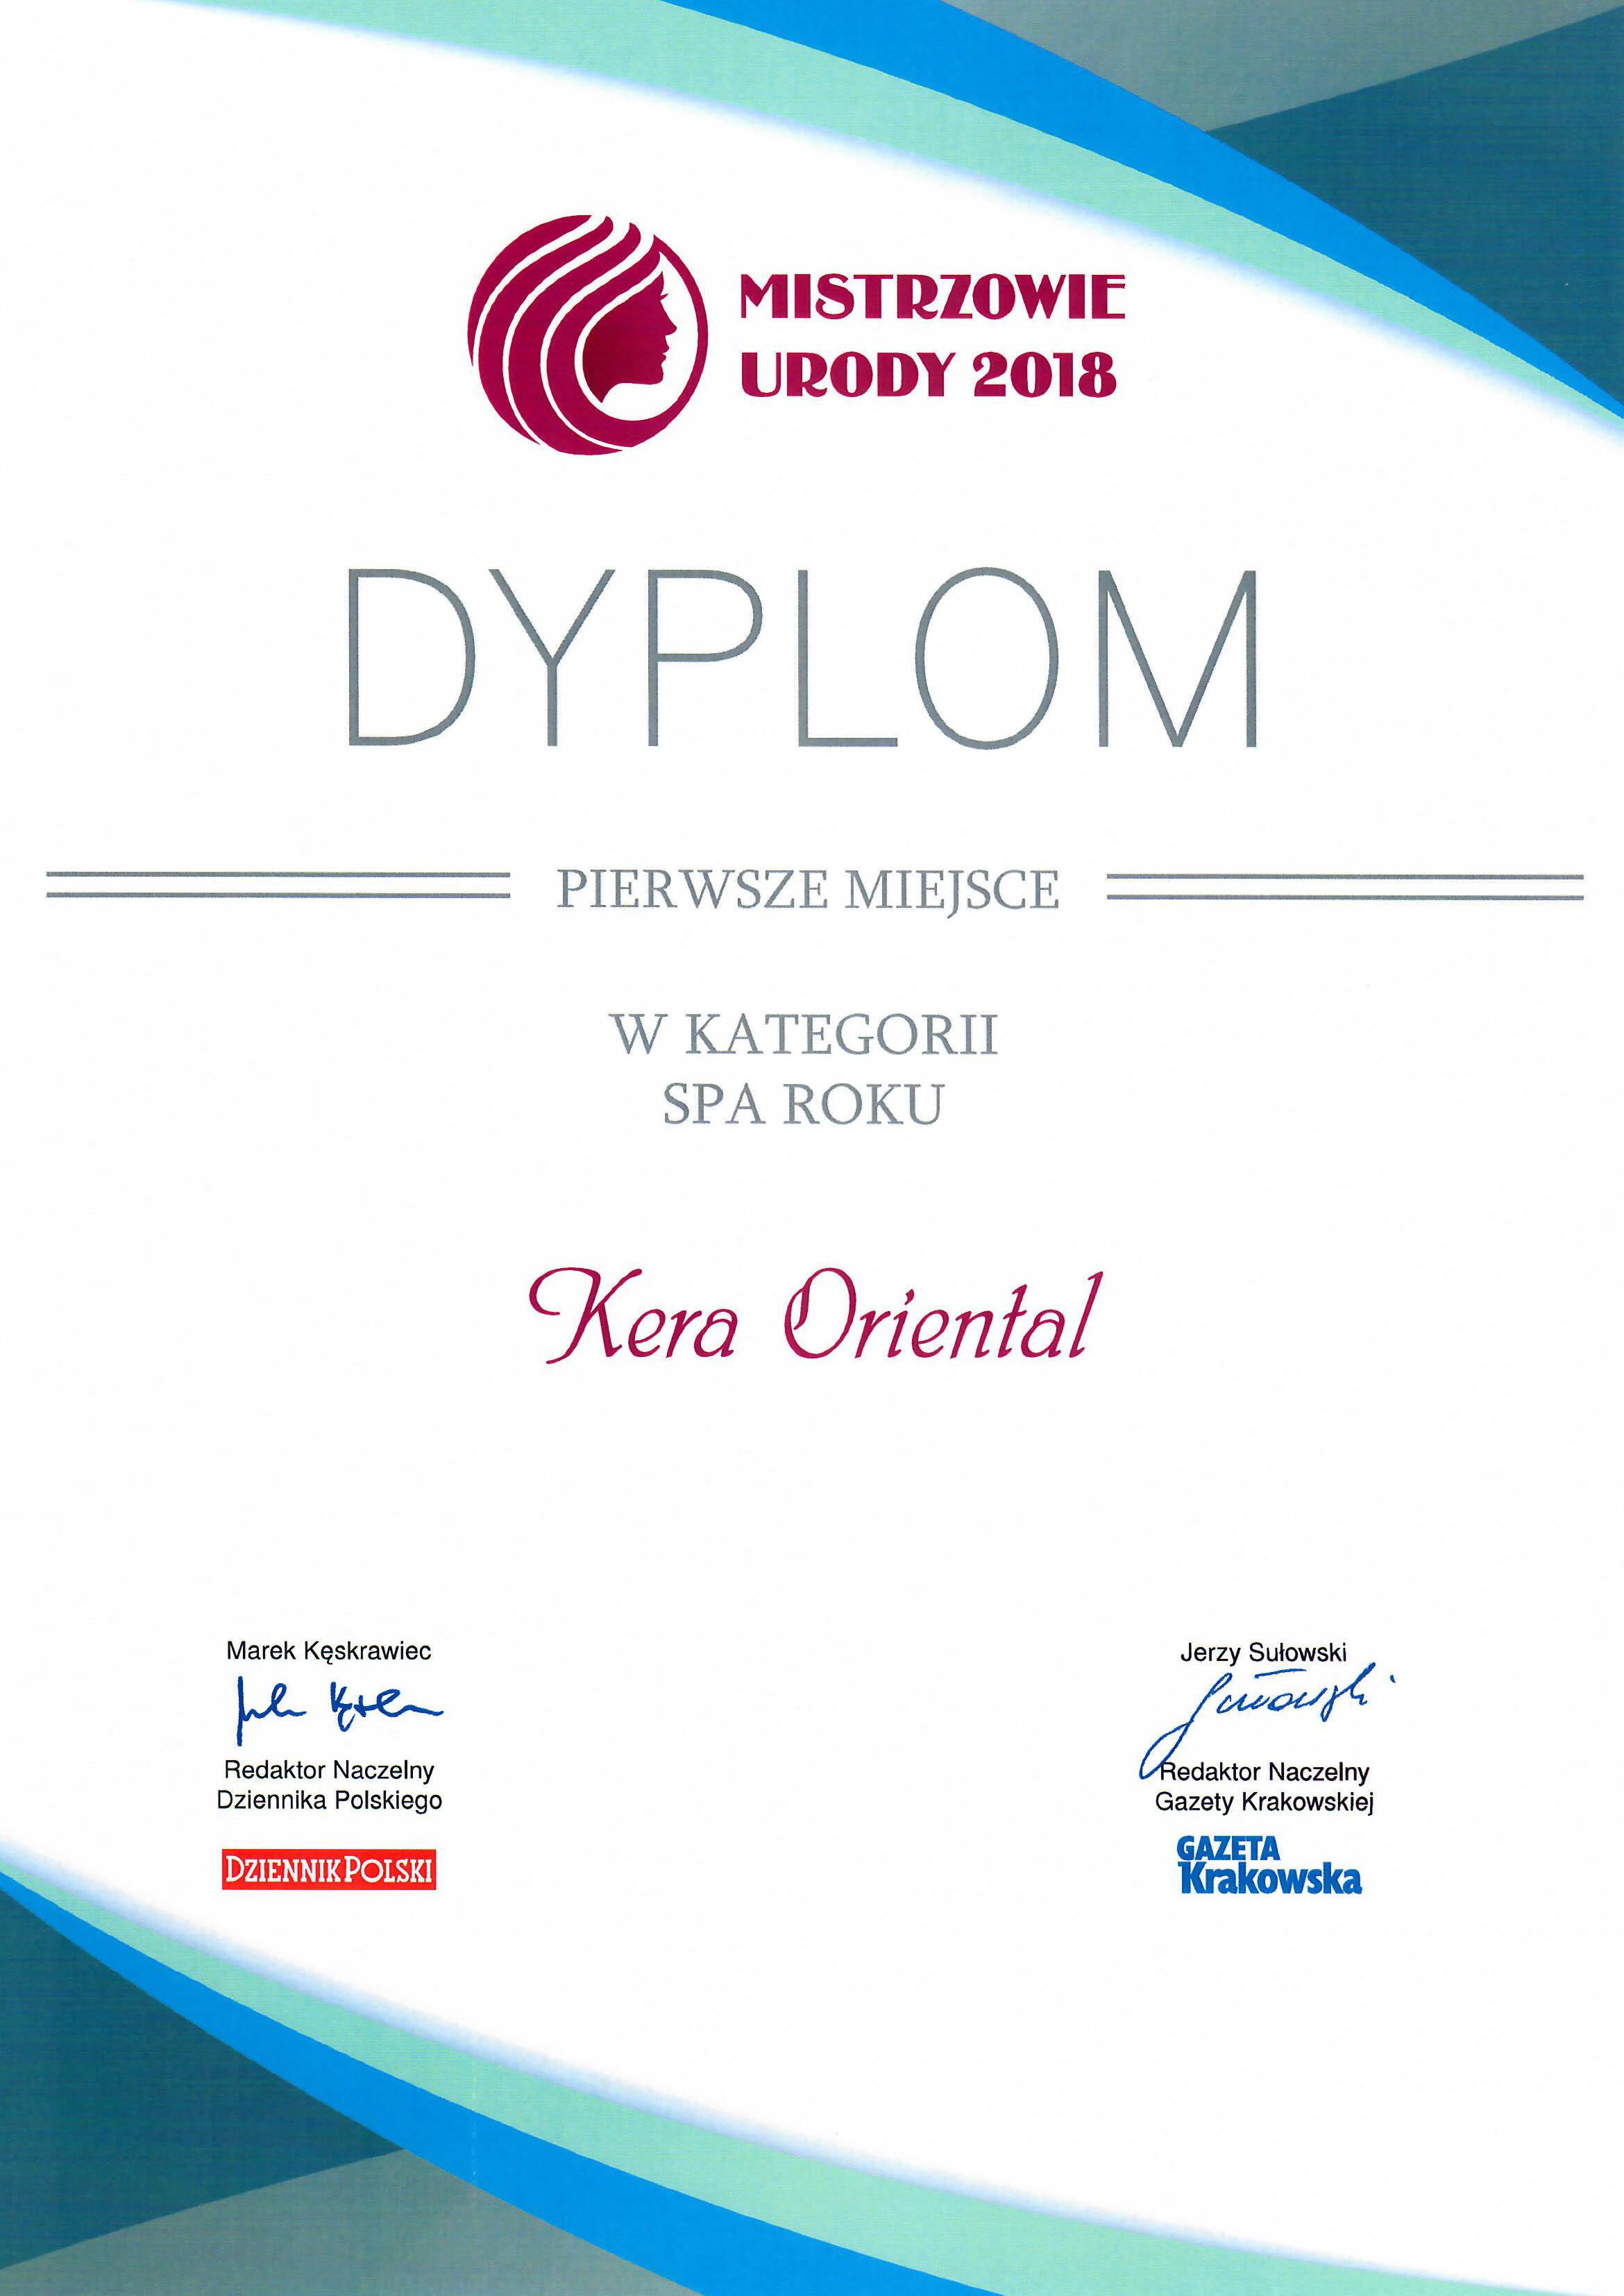 keraoriental-spa-roku-malopolska-2018-krakow.jpg